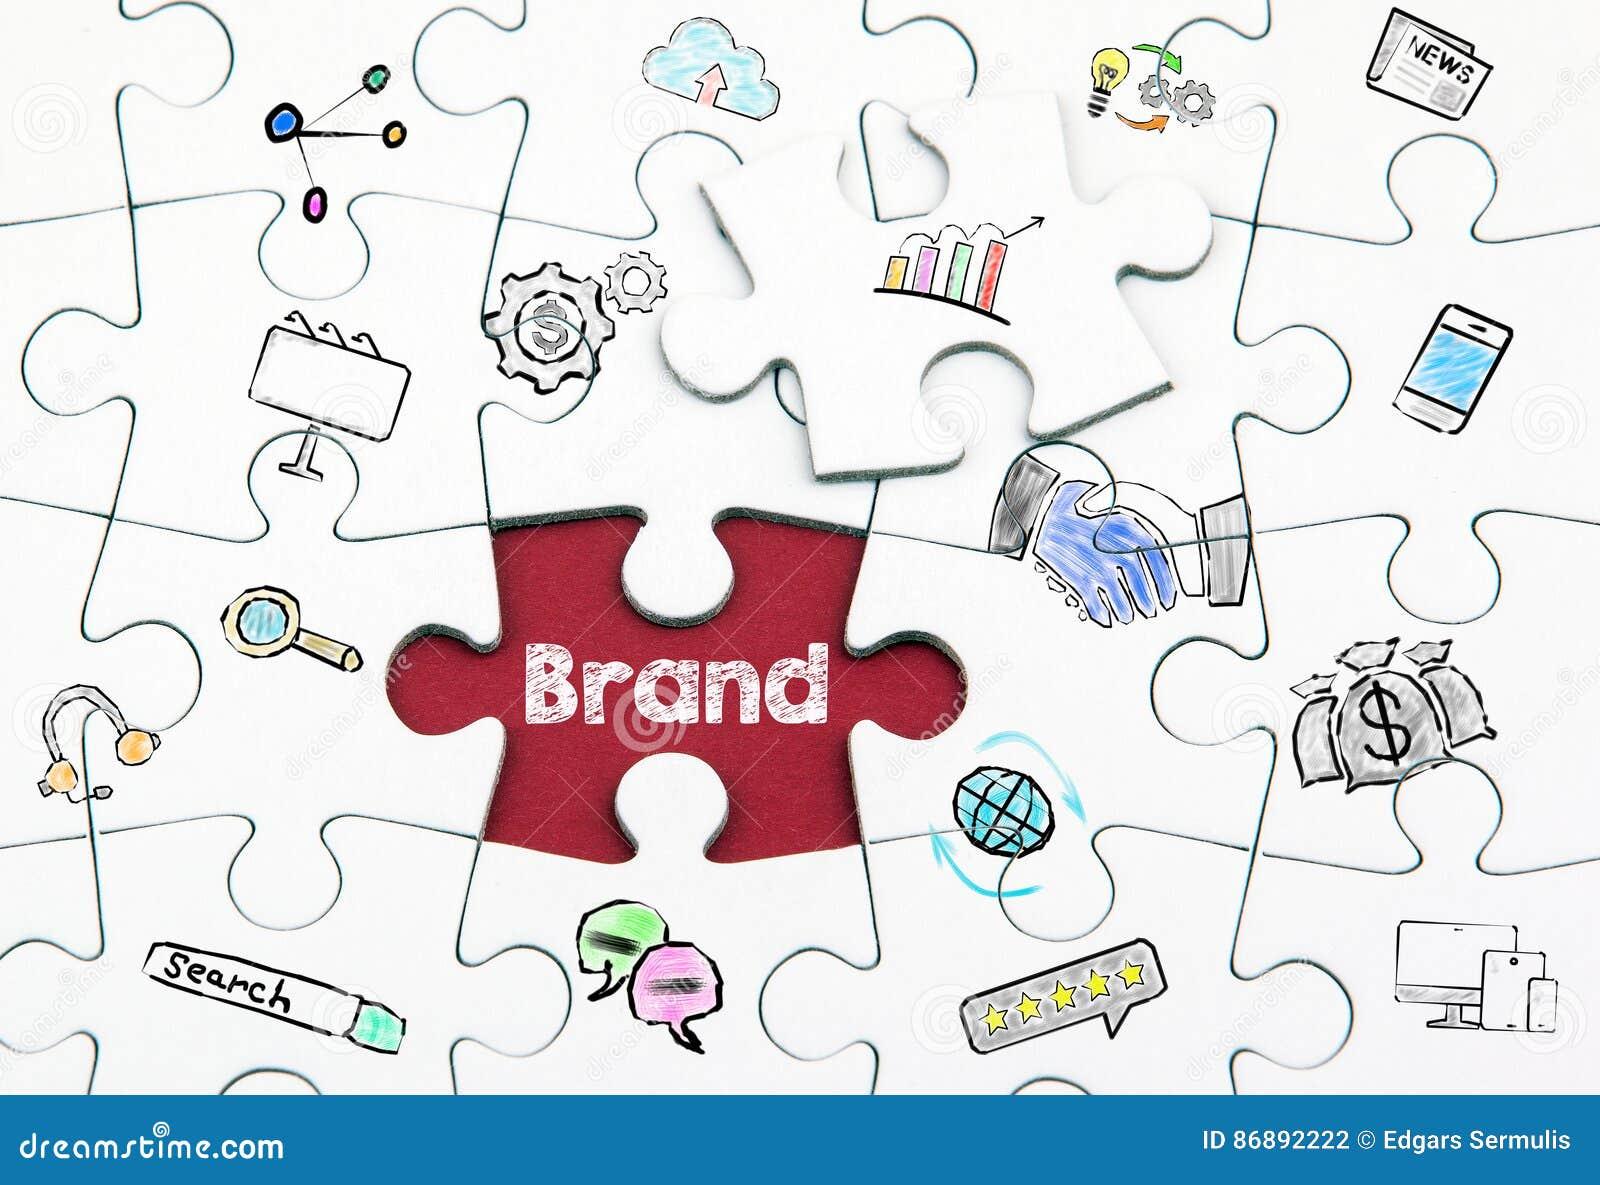 Brand concept. Last piece of a Puzzle